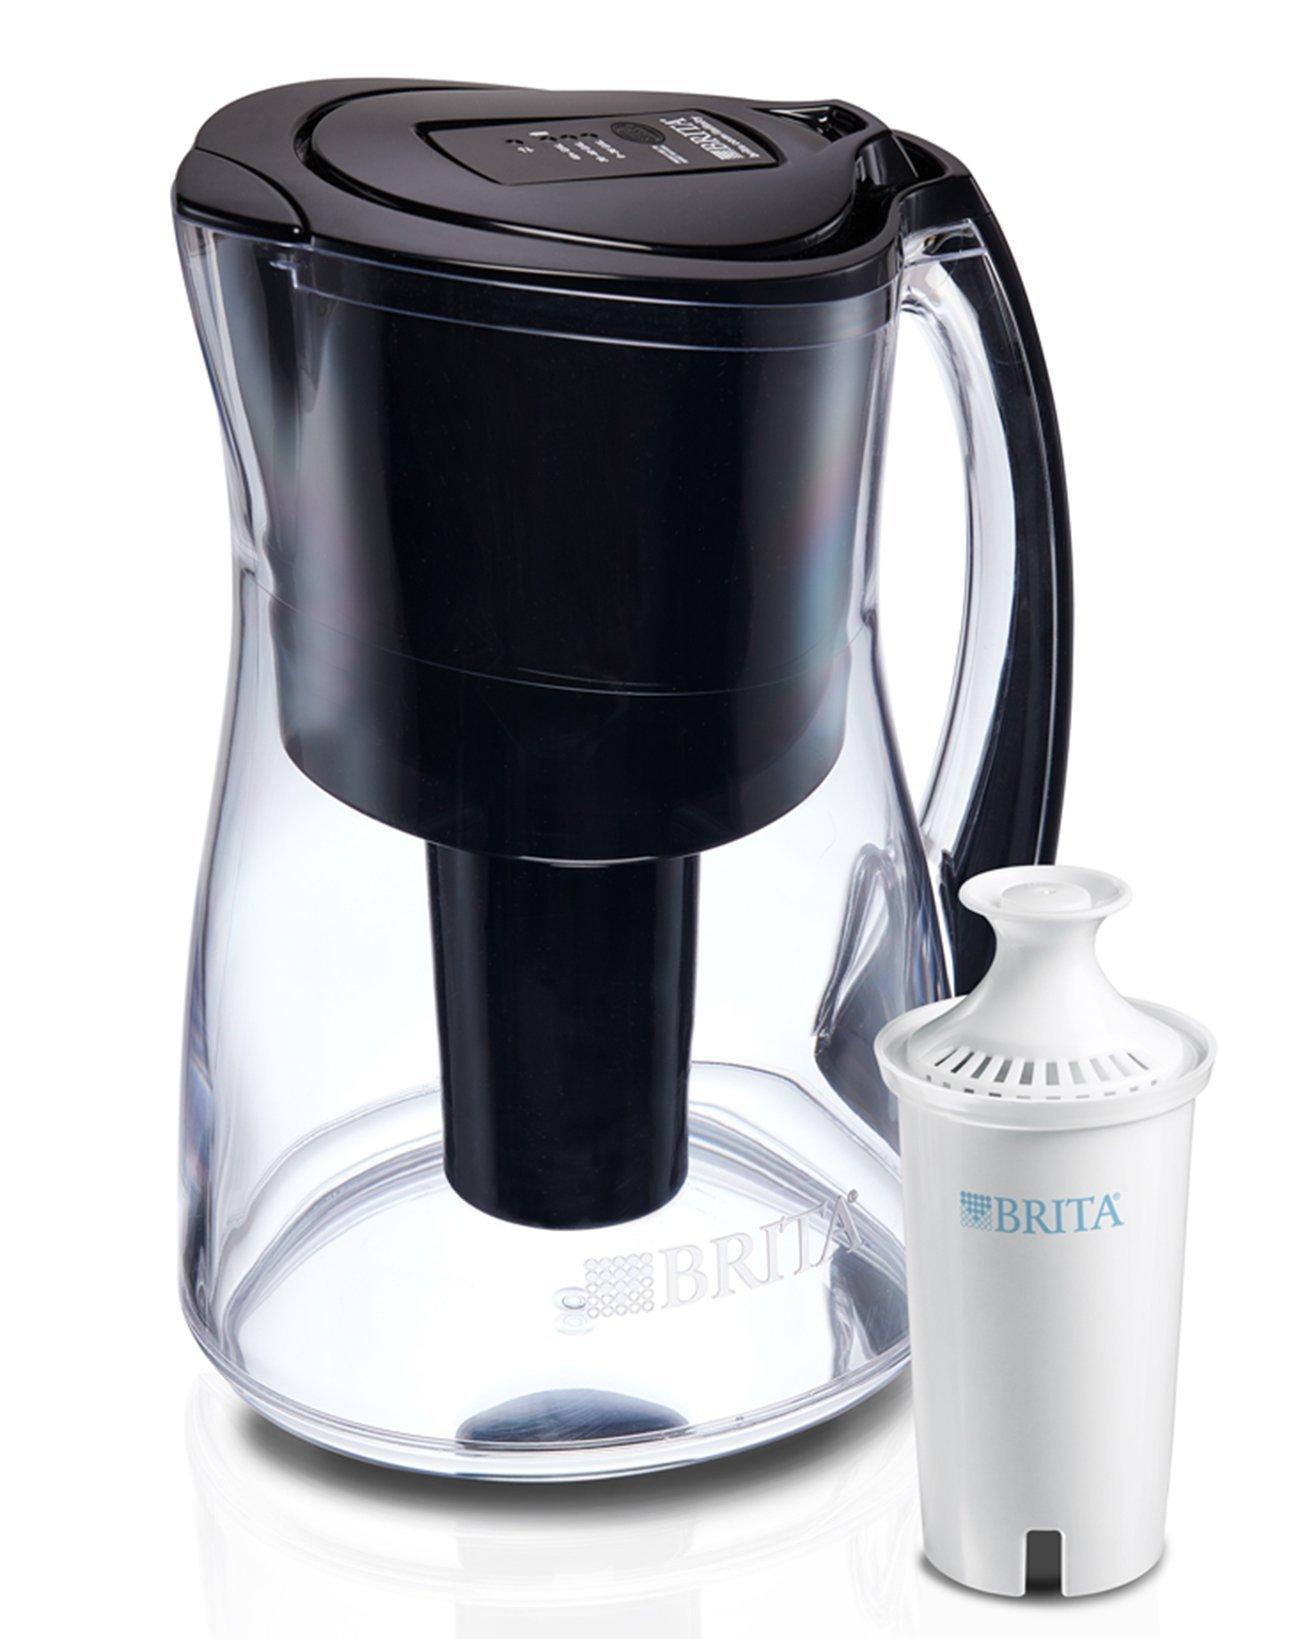 Cheap Black Brita Filter, find Black Brita Filter deals on line at ...